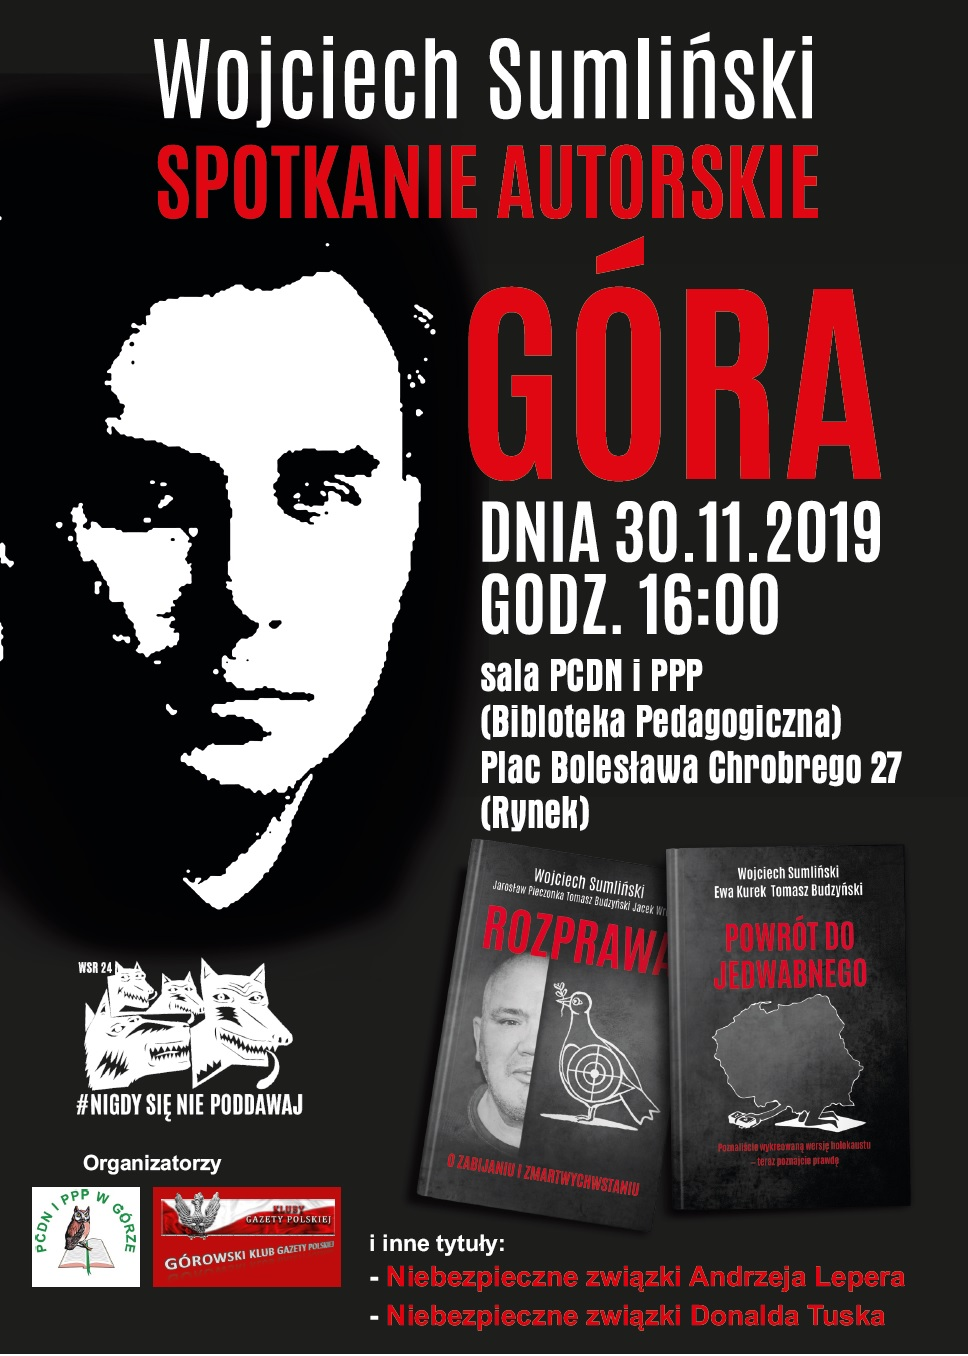 Gora Sl - Sumlinski 2019